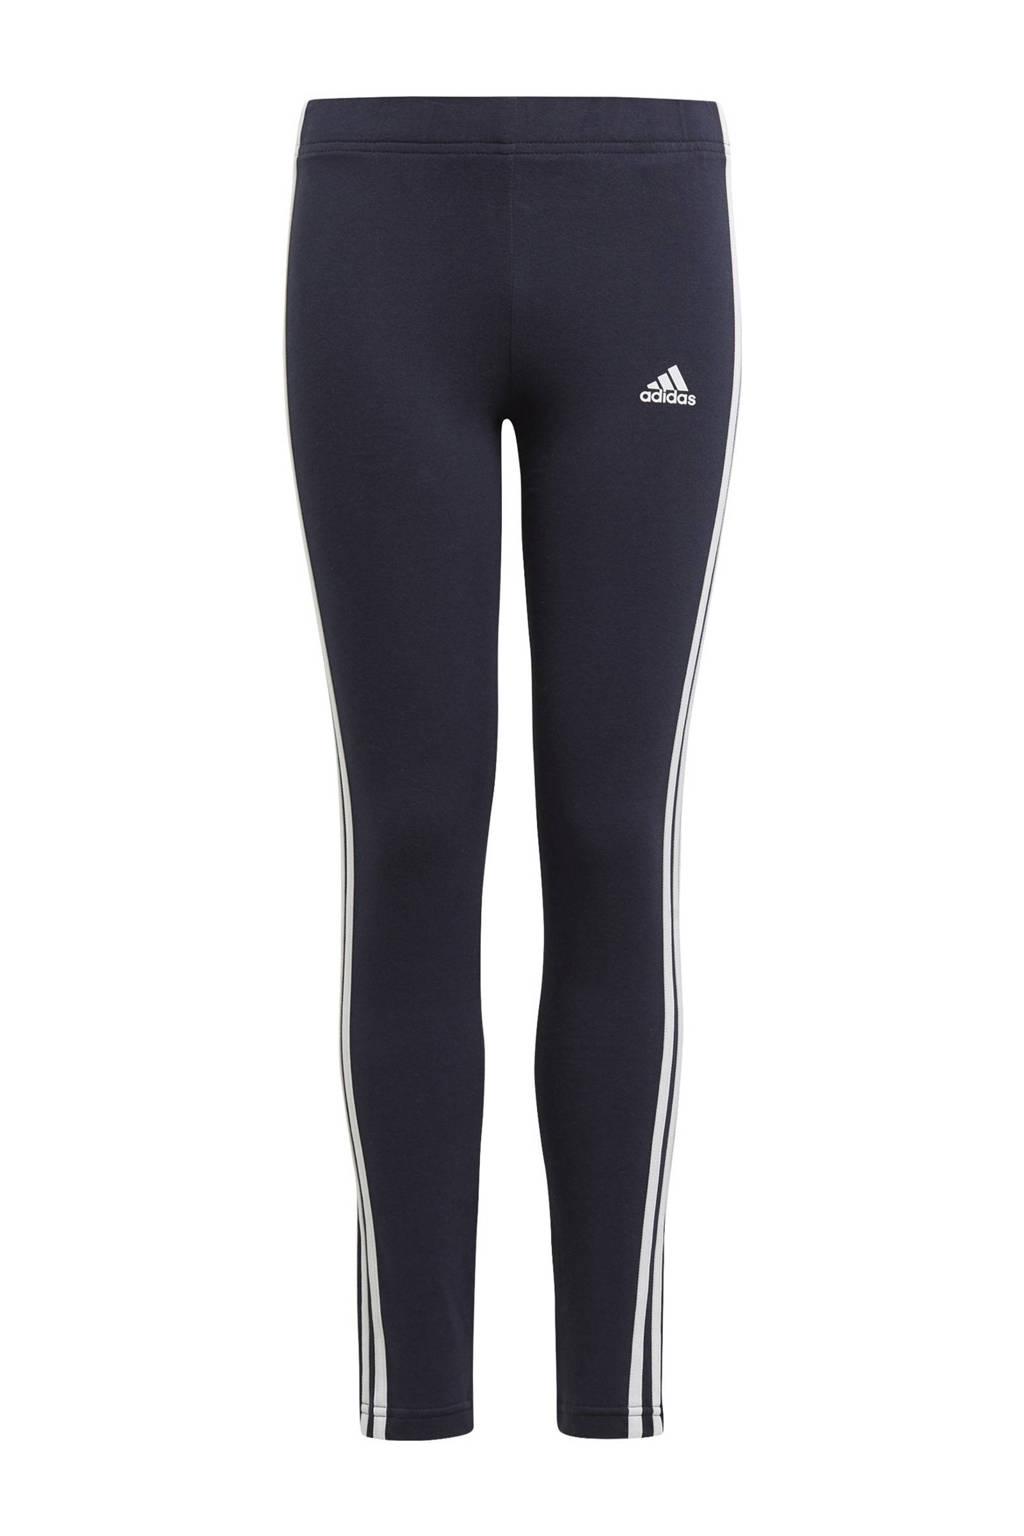 adidas Performance sportlegging donkerblauw/wit, Donkerblauw/wit